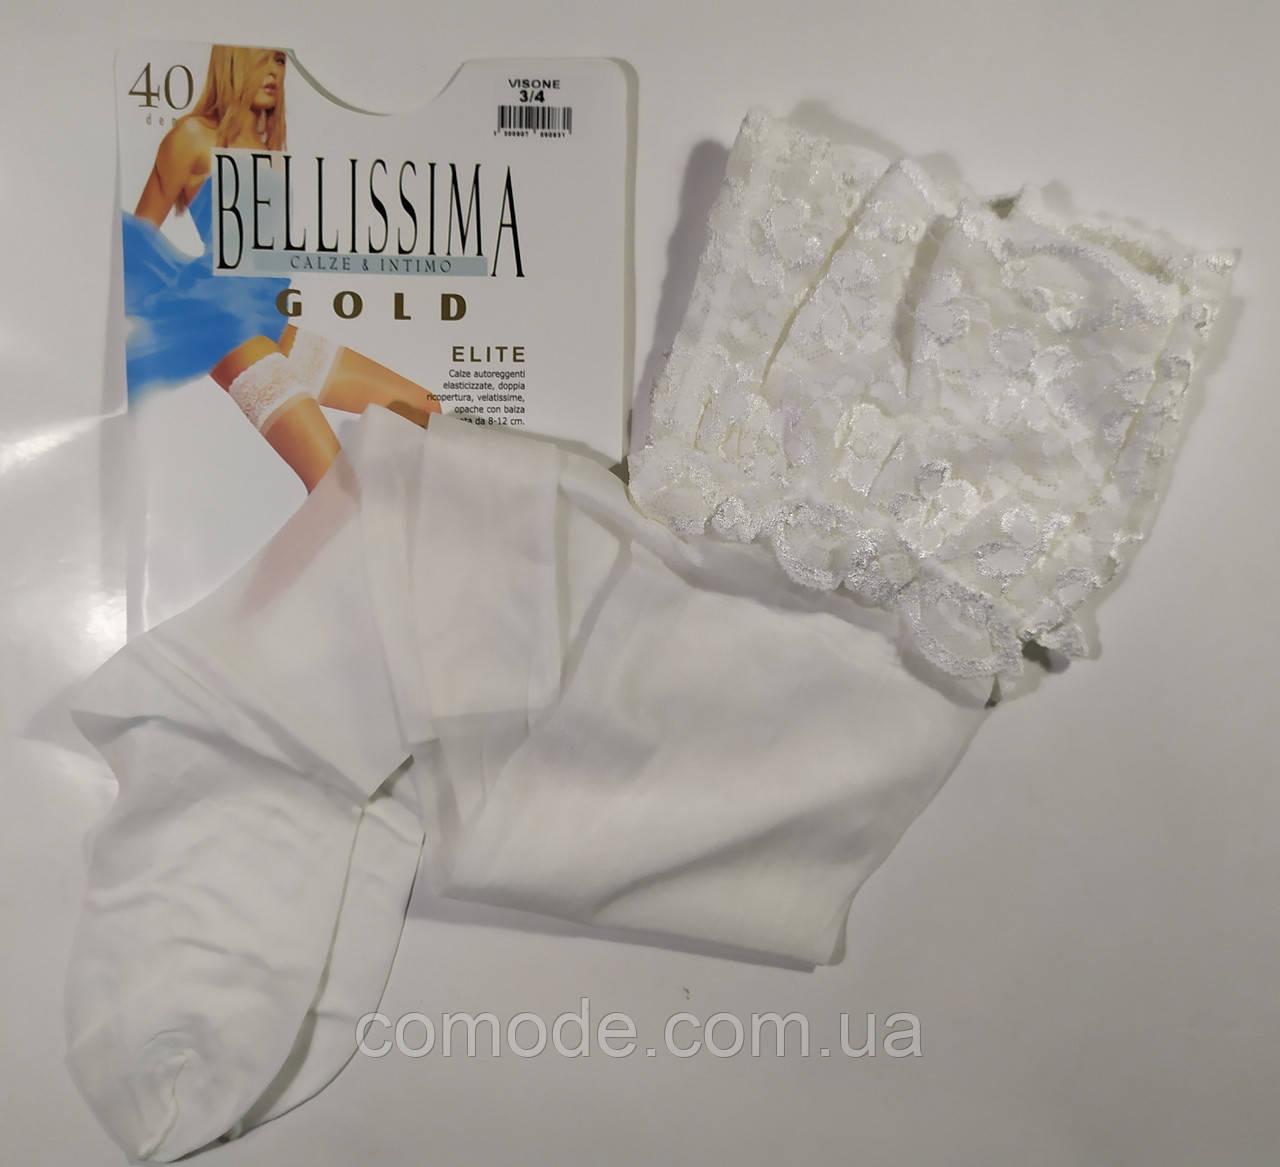 Чулки женские Bellissima 40 den